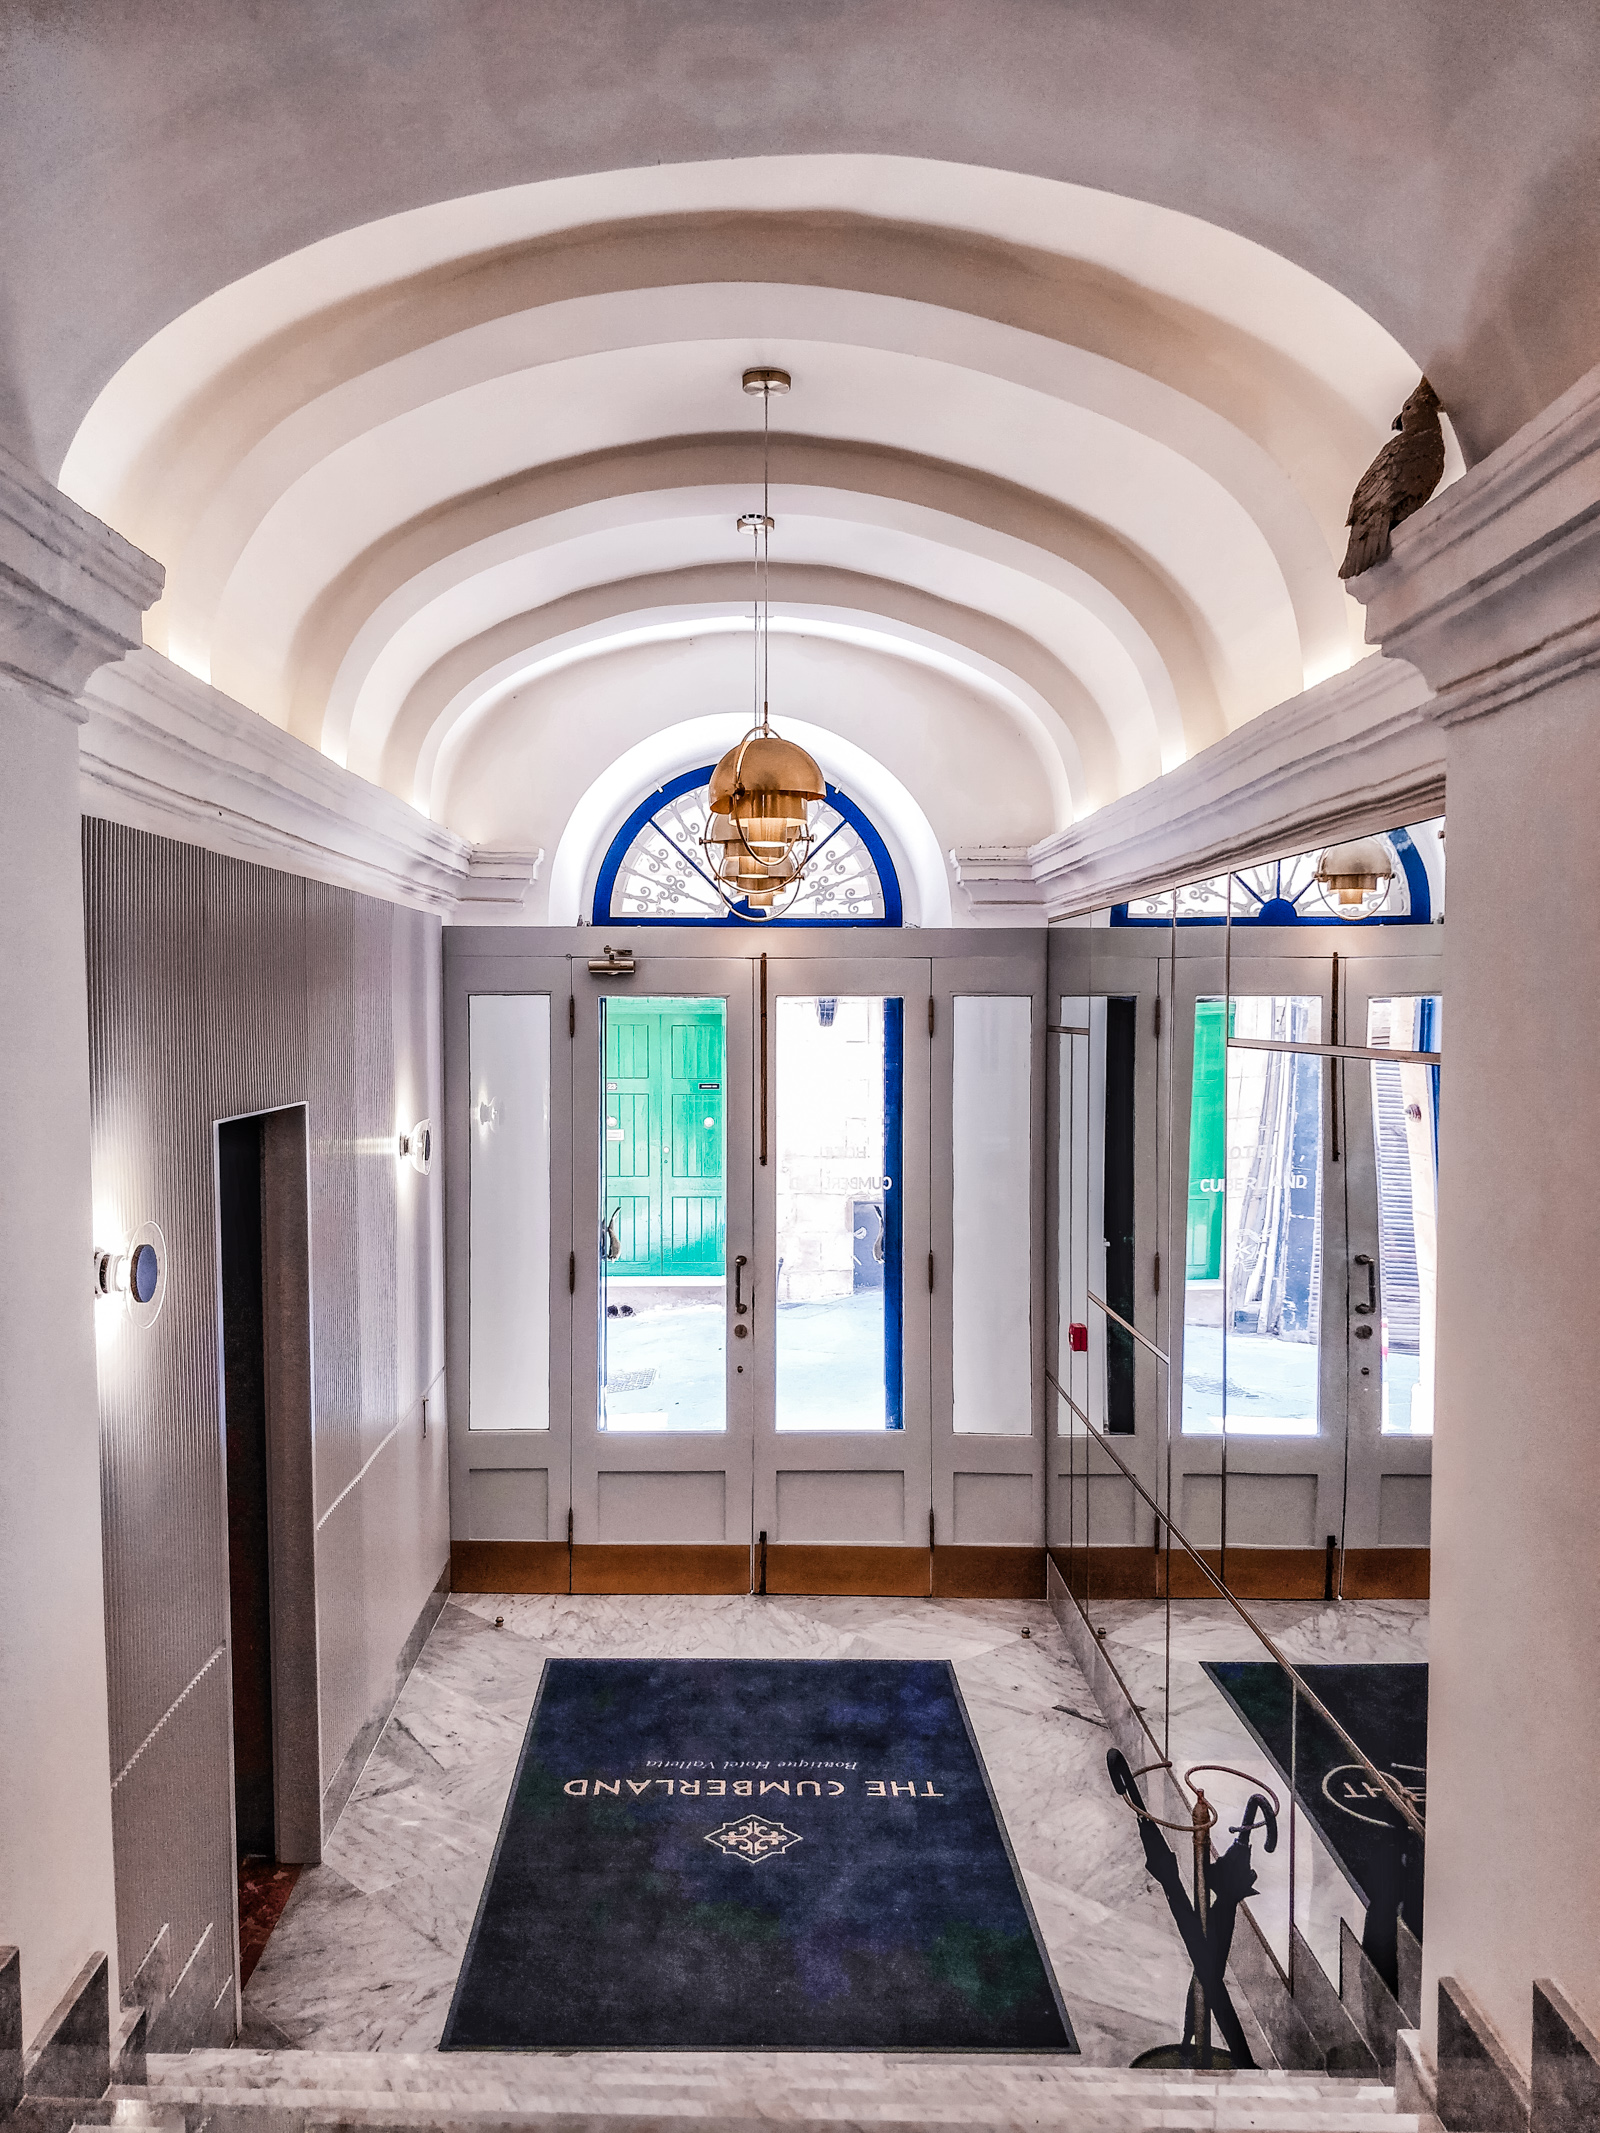 cumberland hotel malta valletta